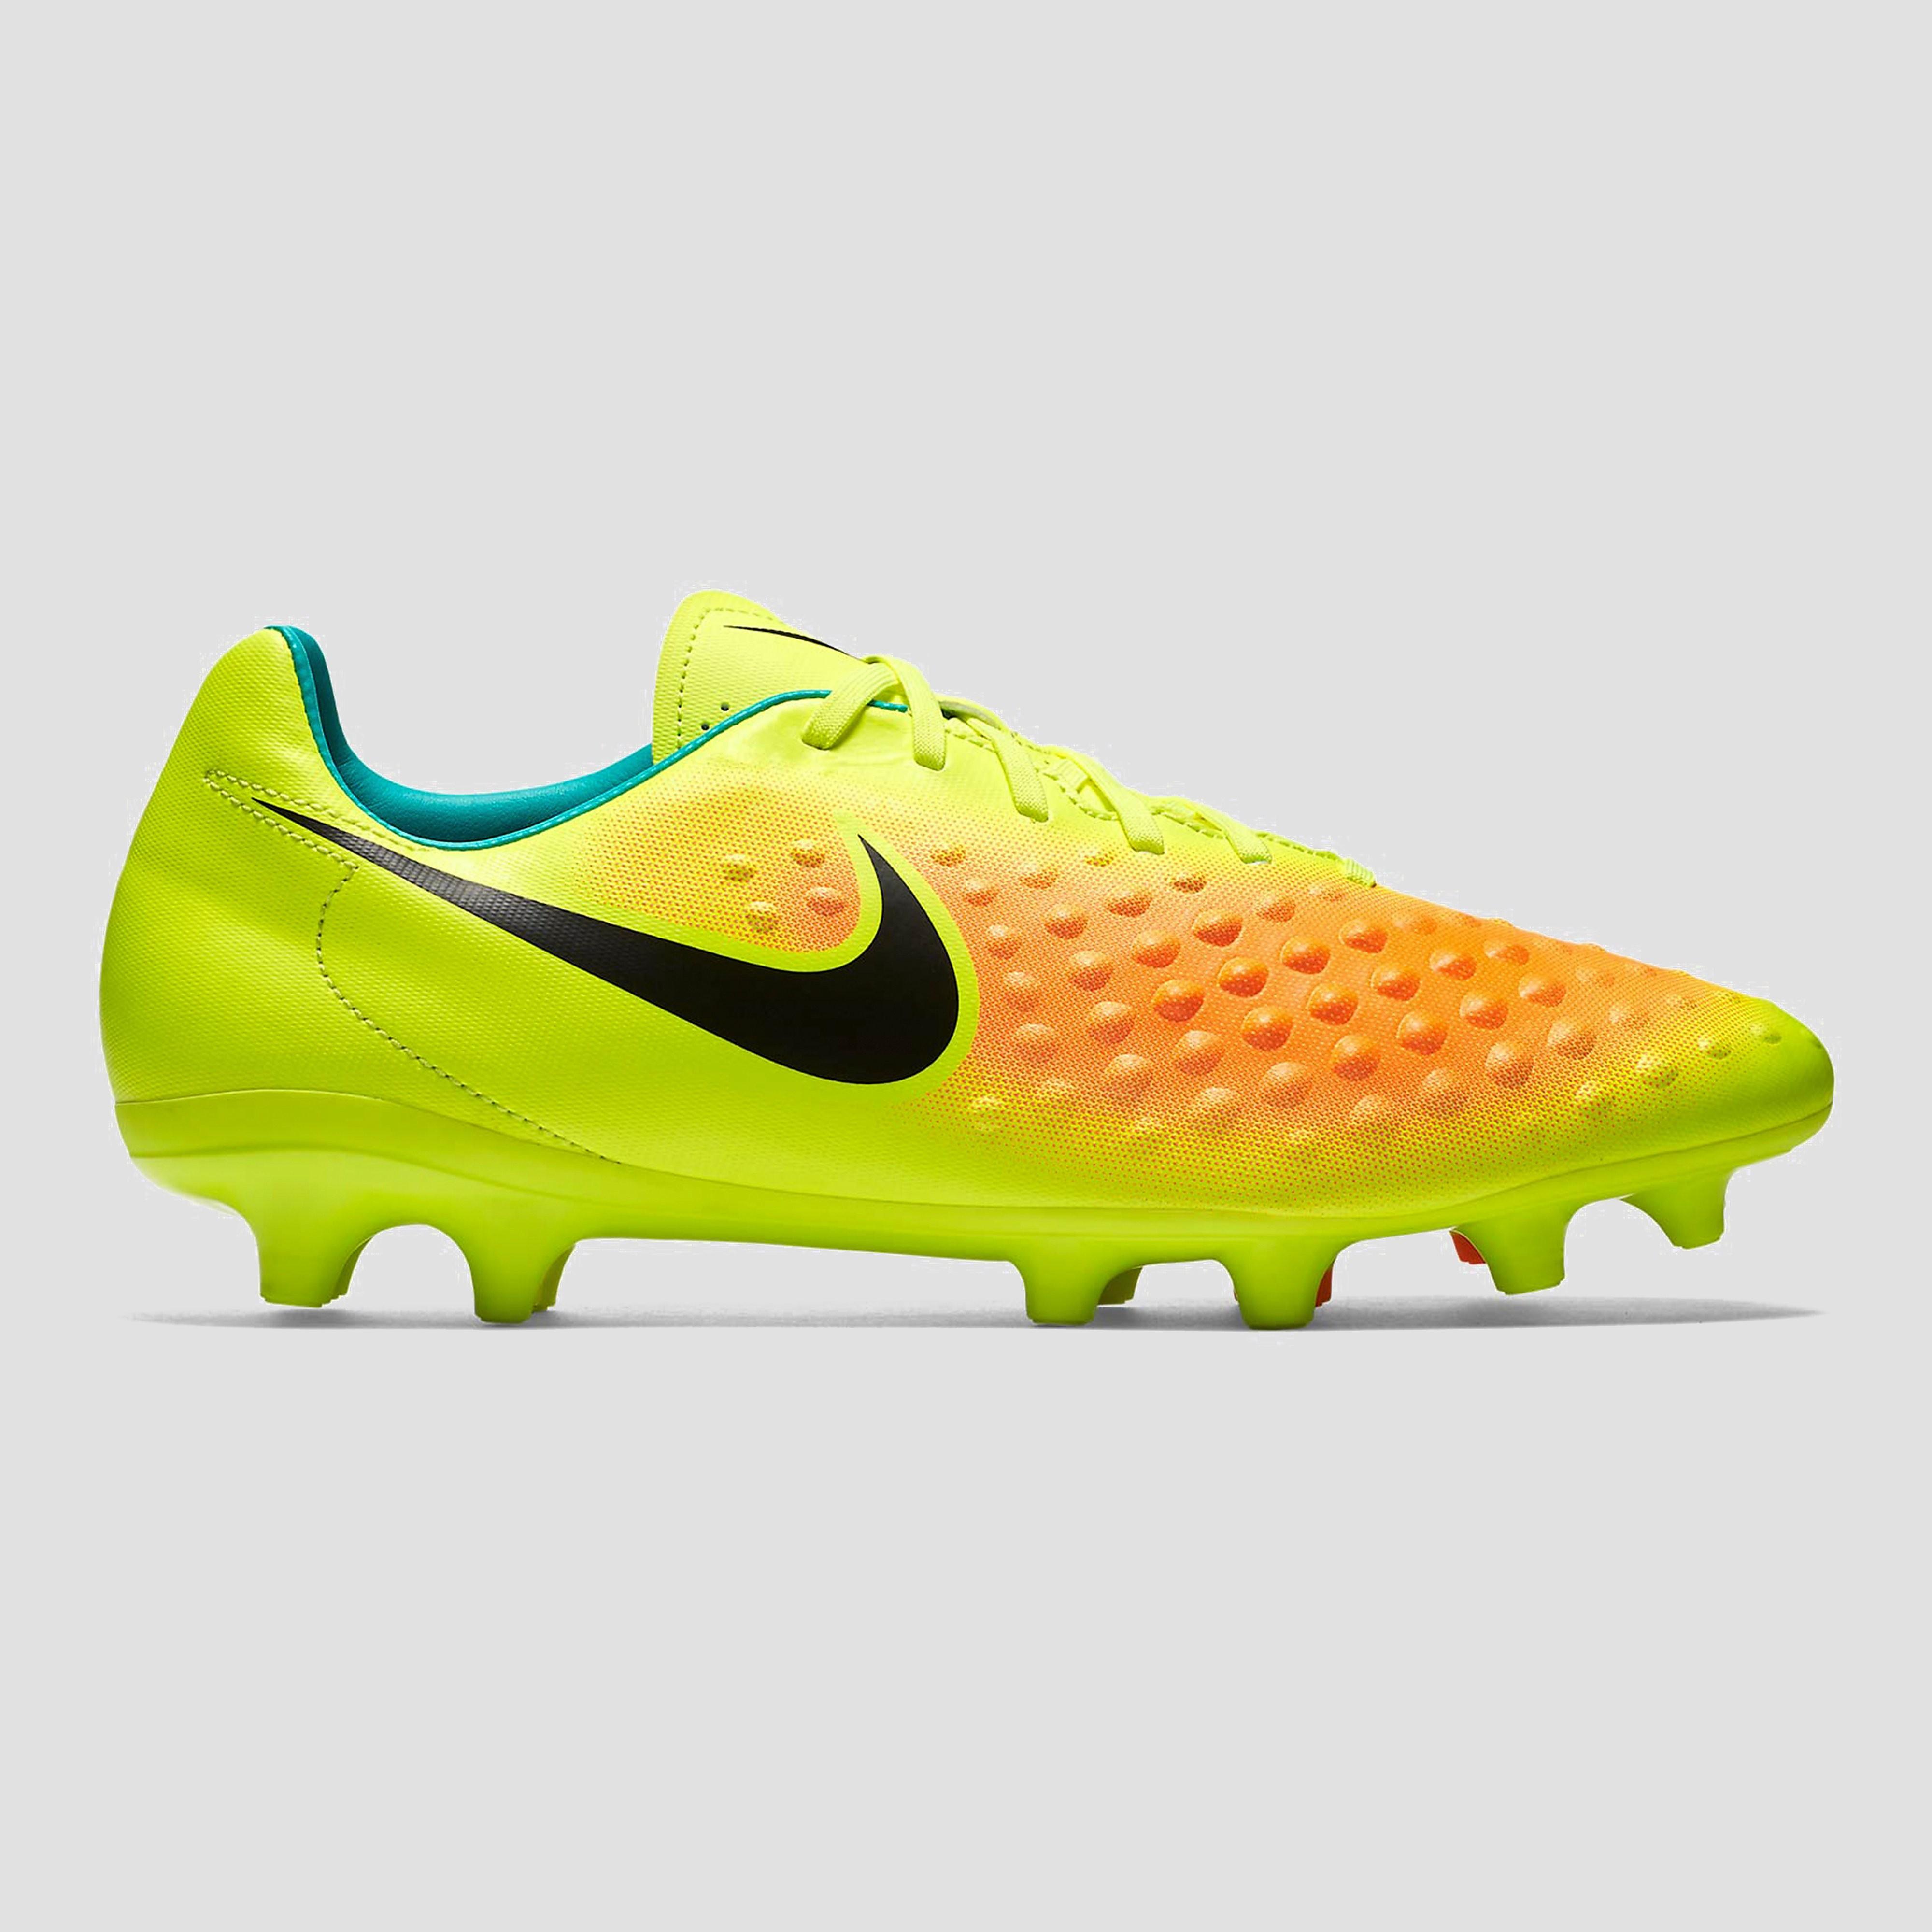 Nike MAGISTA OPUS II FG JR